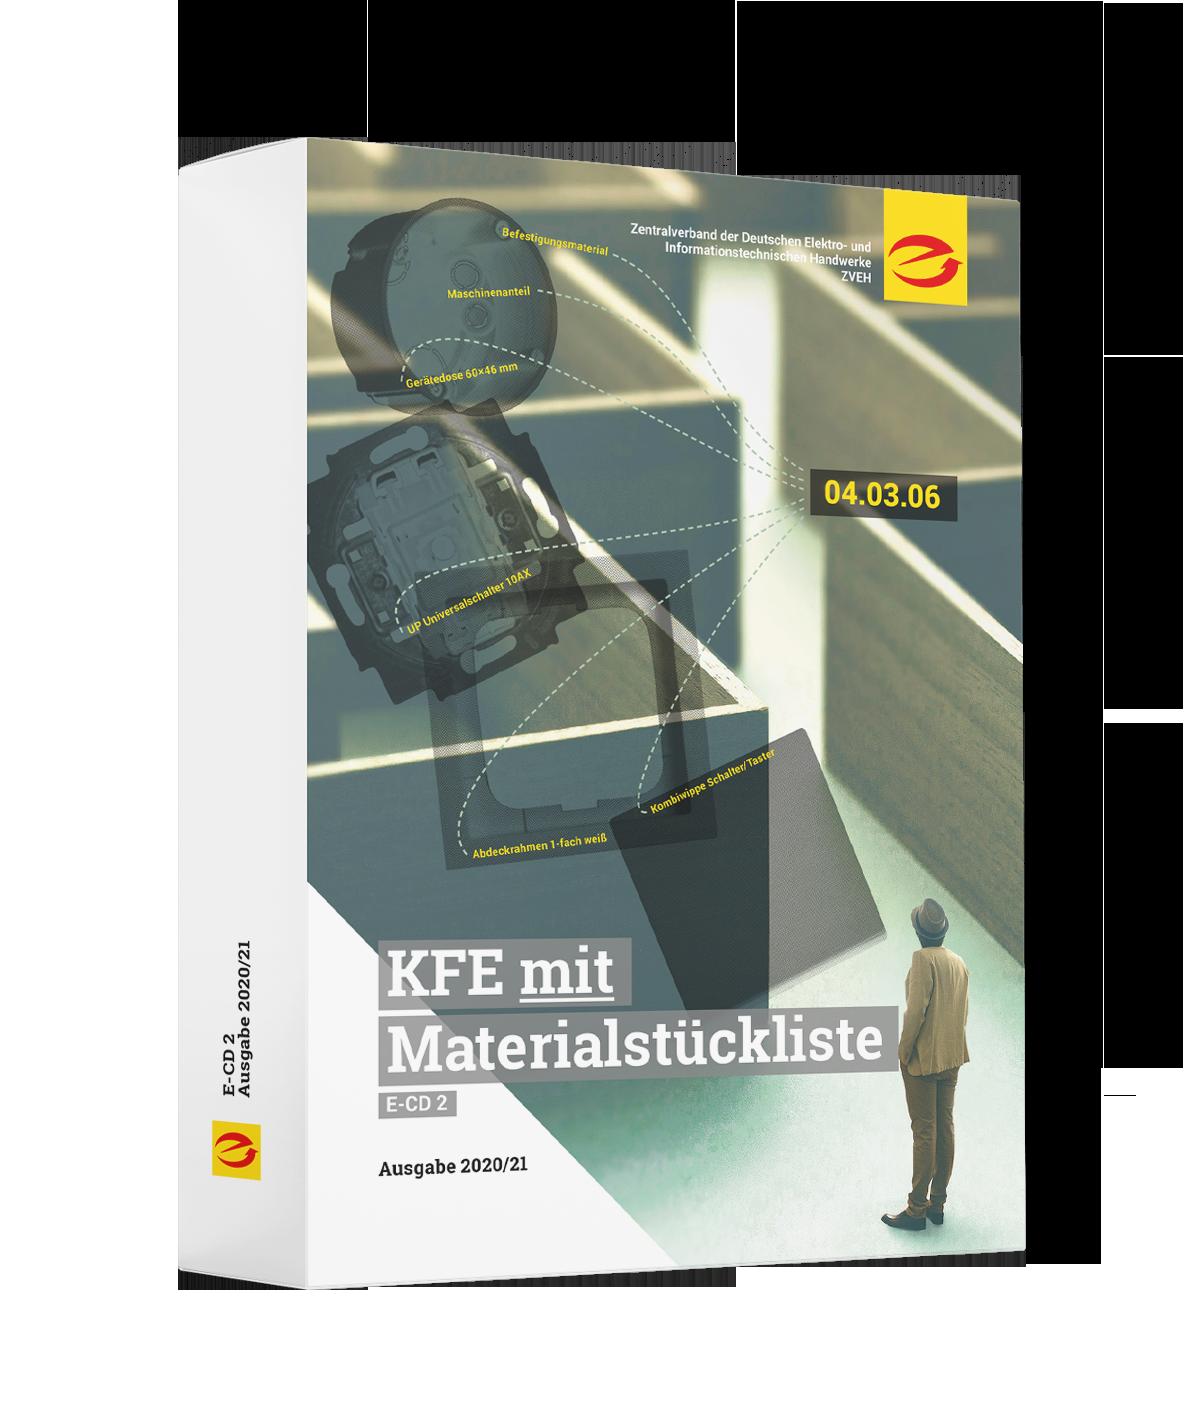 KFE-Daten mit Materialstückliste, Ausgabe 2020/21 (E-CD 2)